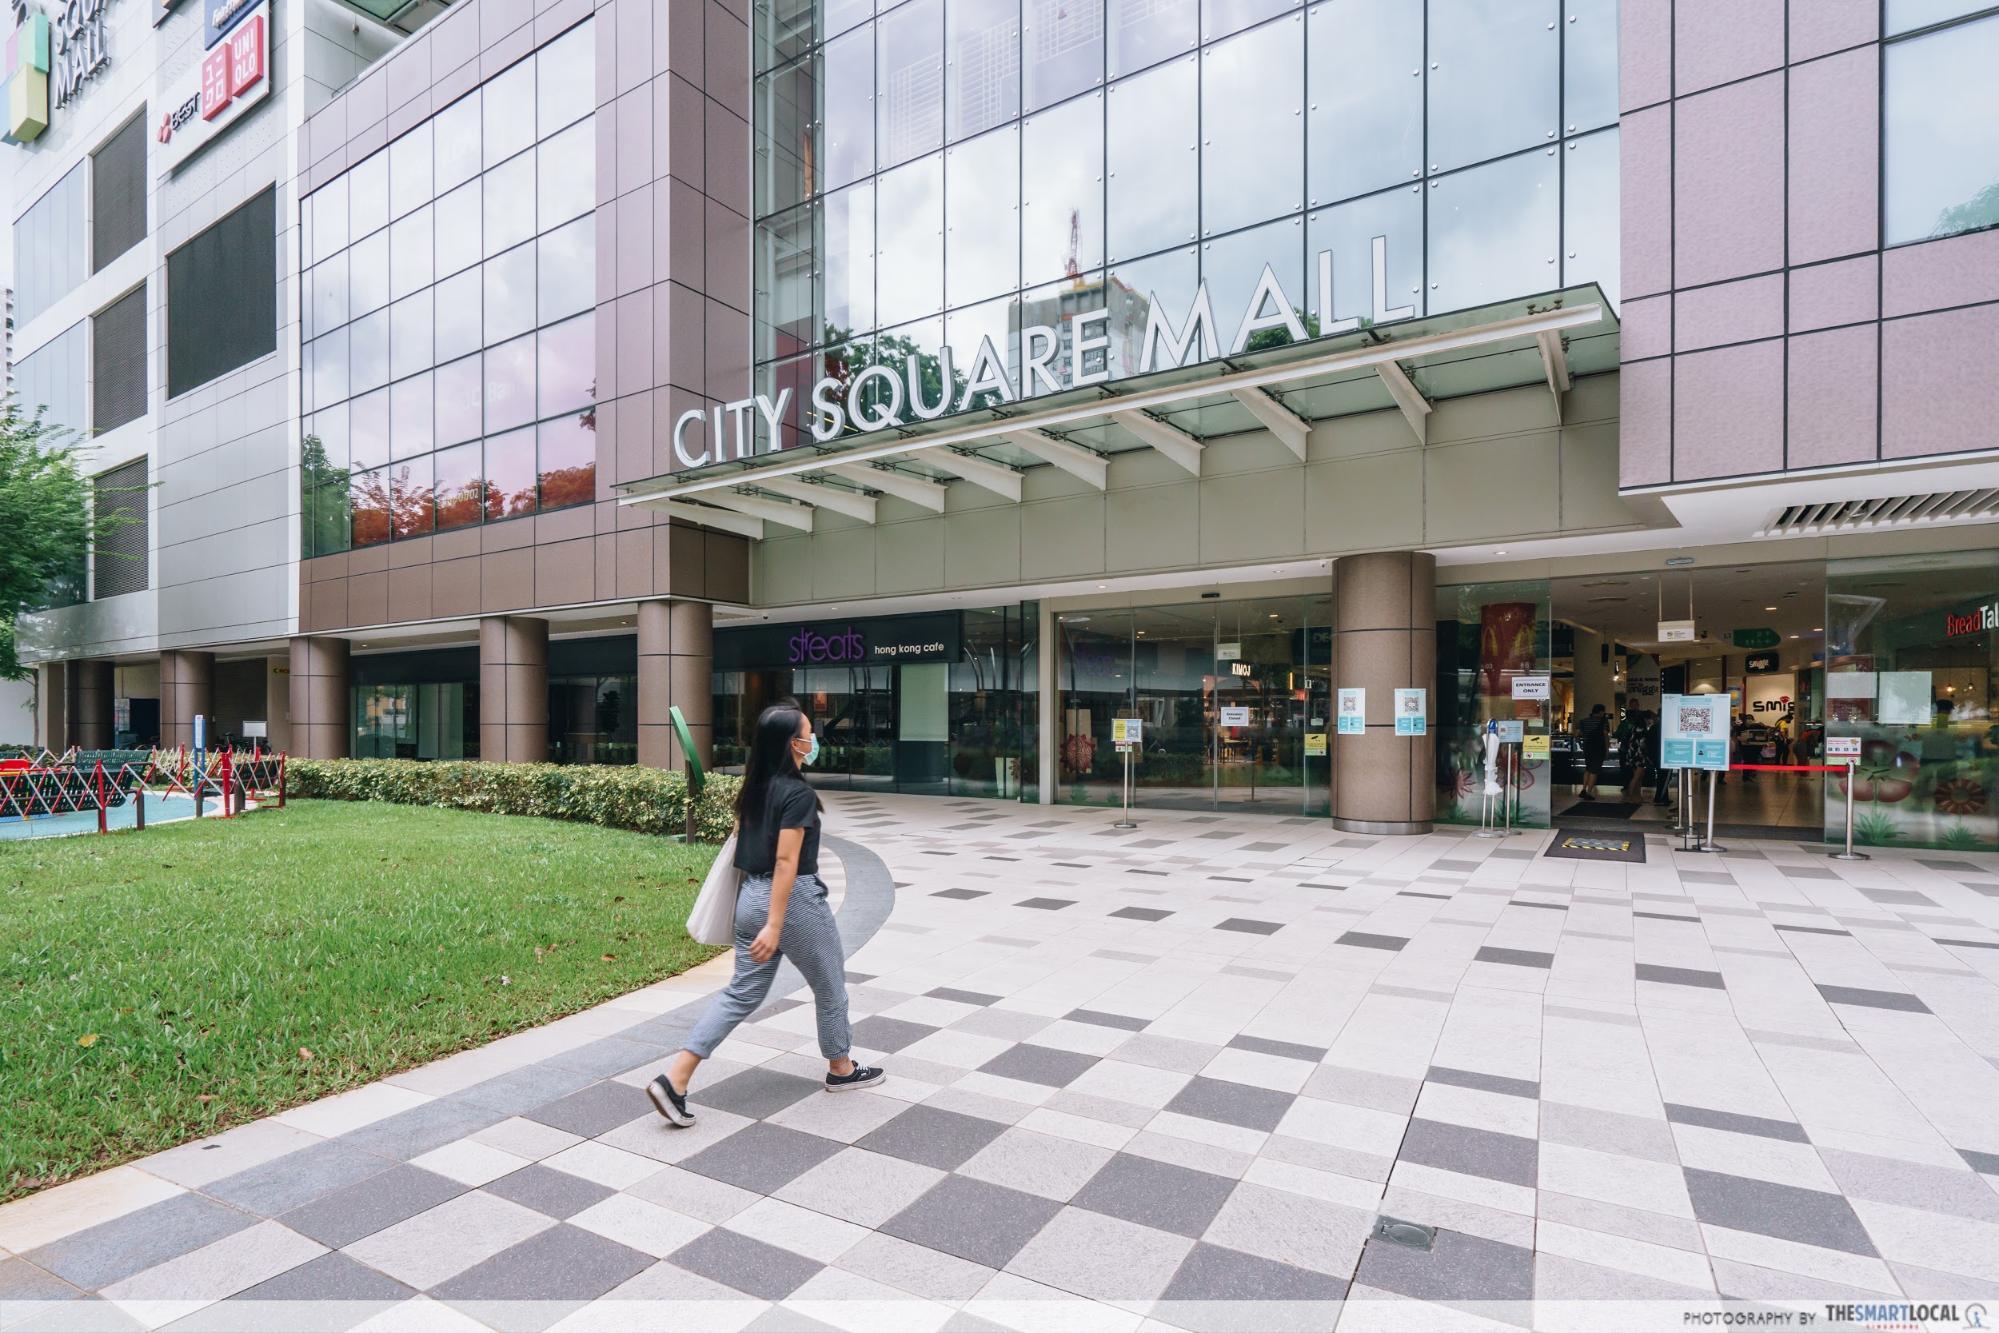 City Square Mall - Singapore Shopping Centre